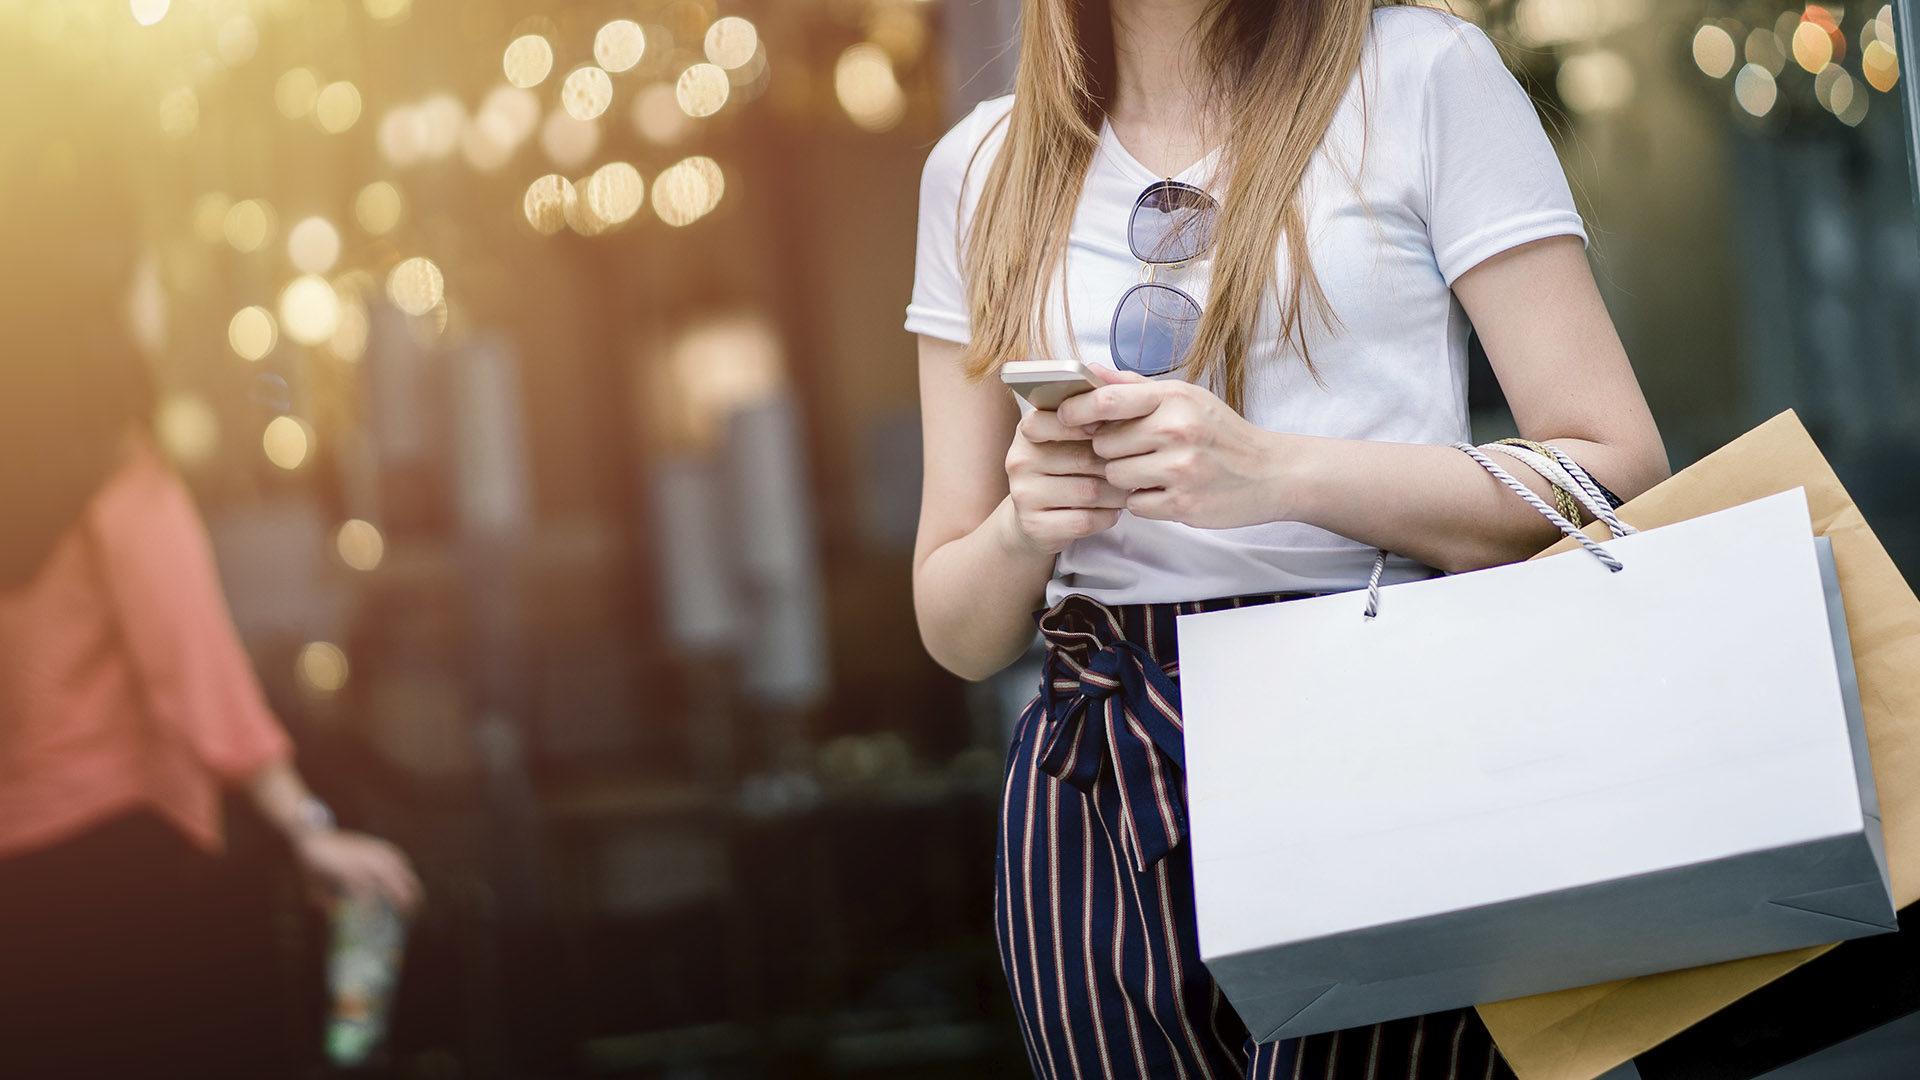 BBVA-Compras-BBVA gGo, beneficios, gastos, tiendas